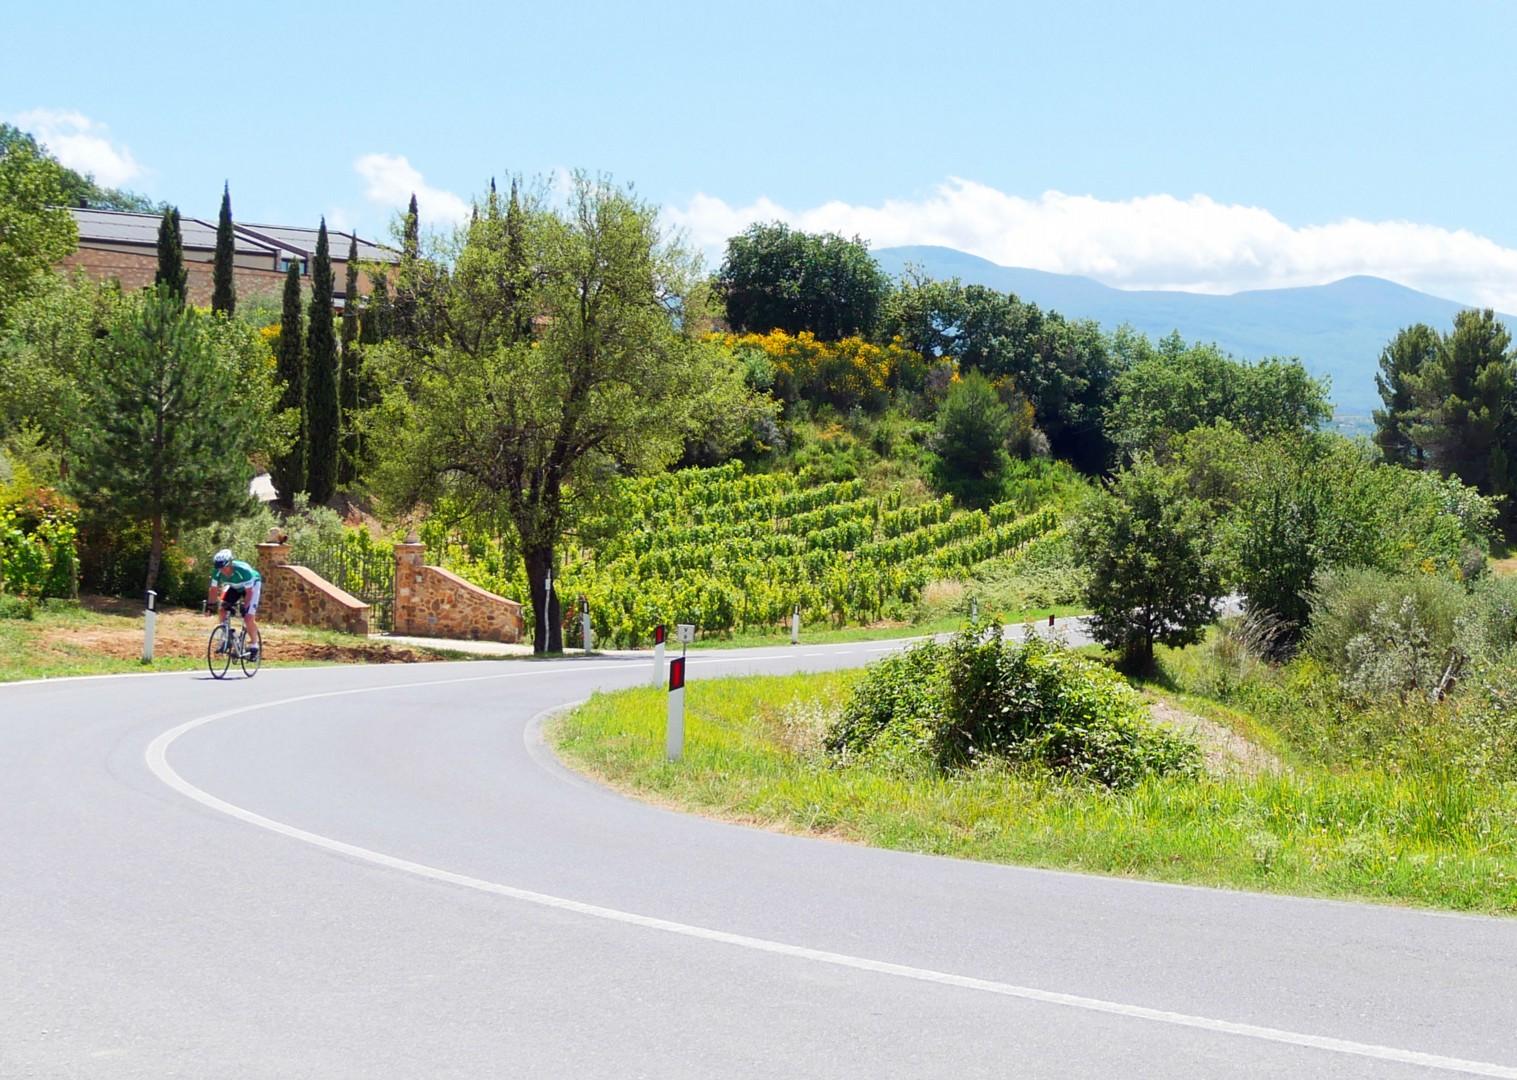 tuscany-tourer-self-guided-road-cycling.jpg - Italy - Tuscany Tourer - Self Guided Road Cycling Holiday - Italia Road Cycling